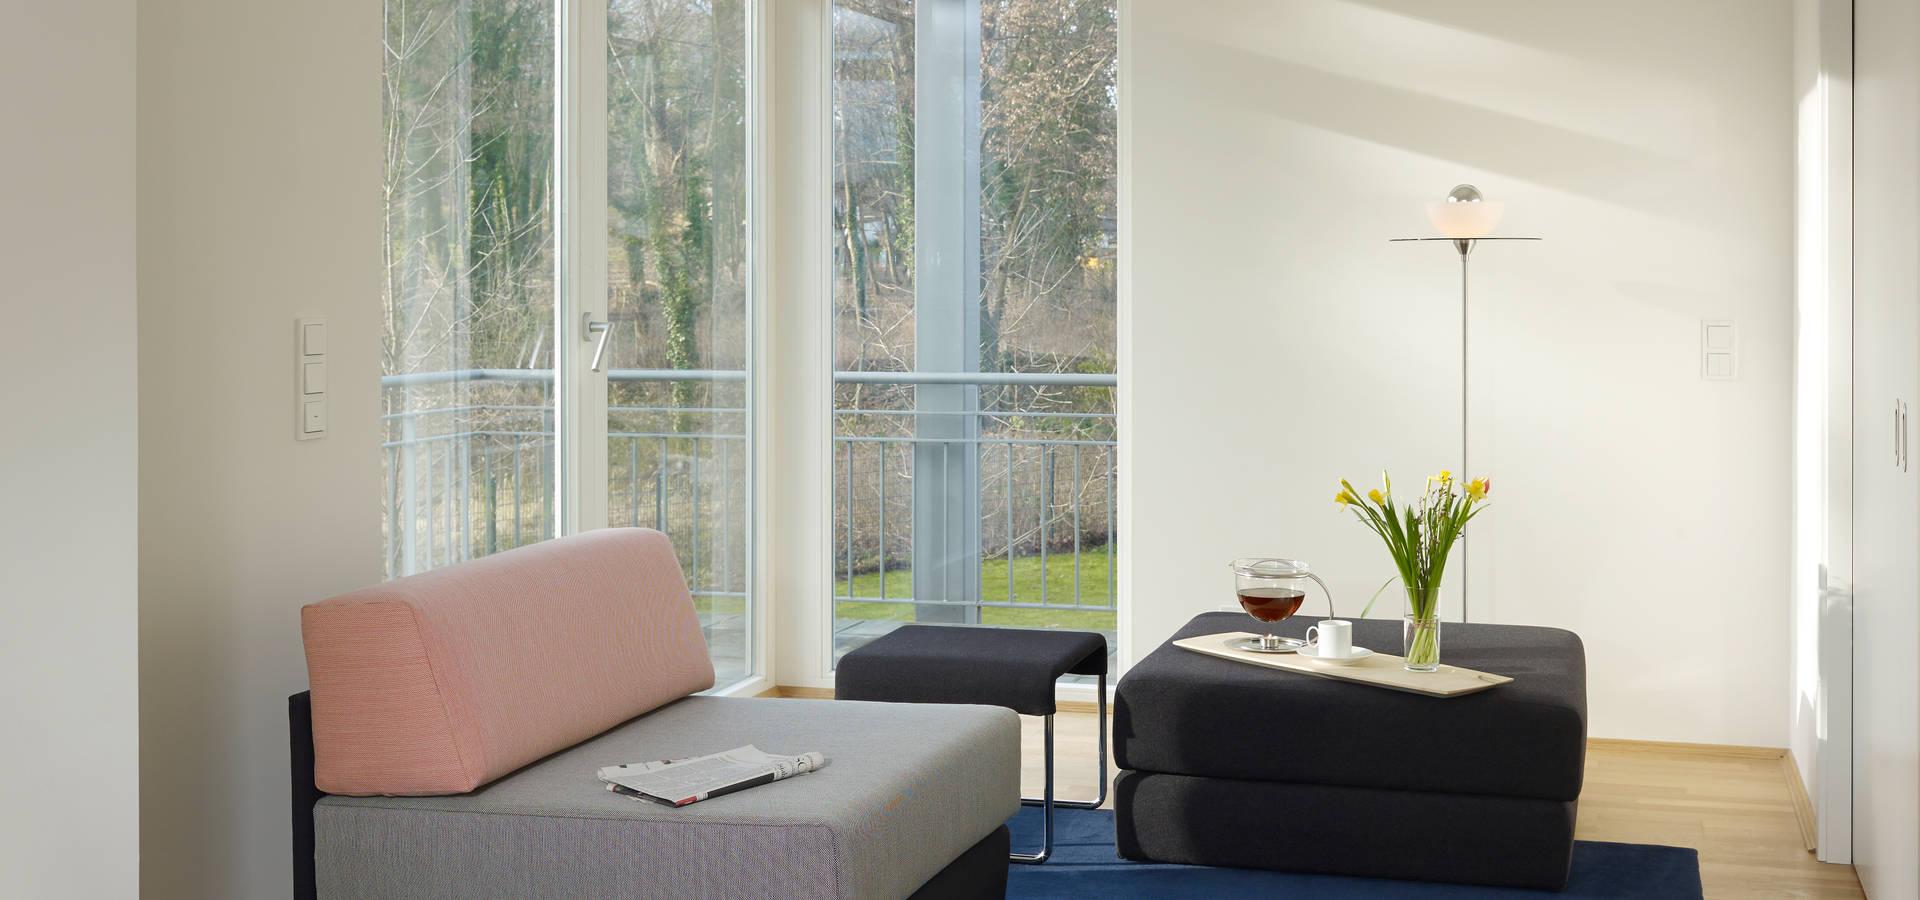 dessau design innenarchitekten in berlin homify. Black Bedroom Furniture Sets. Home Design Ideas